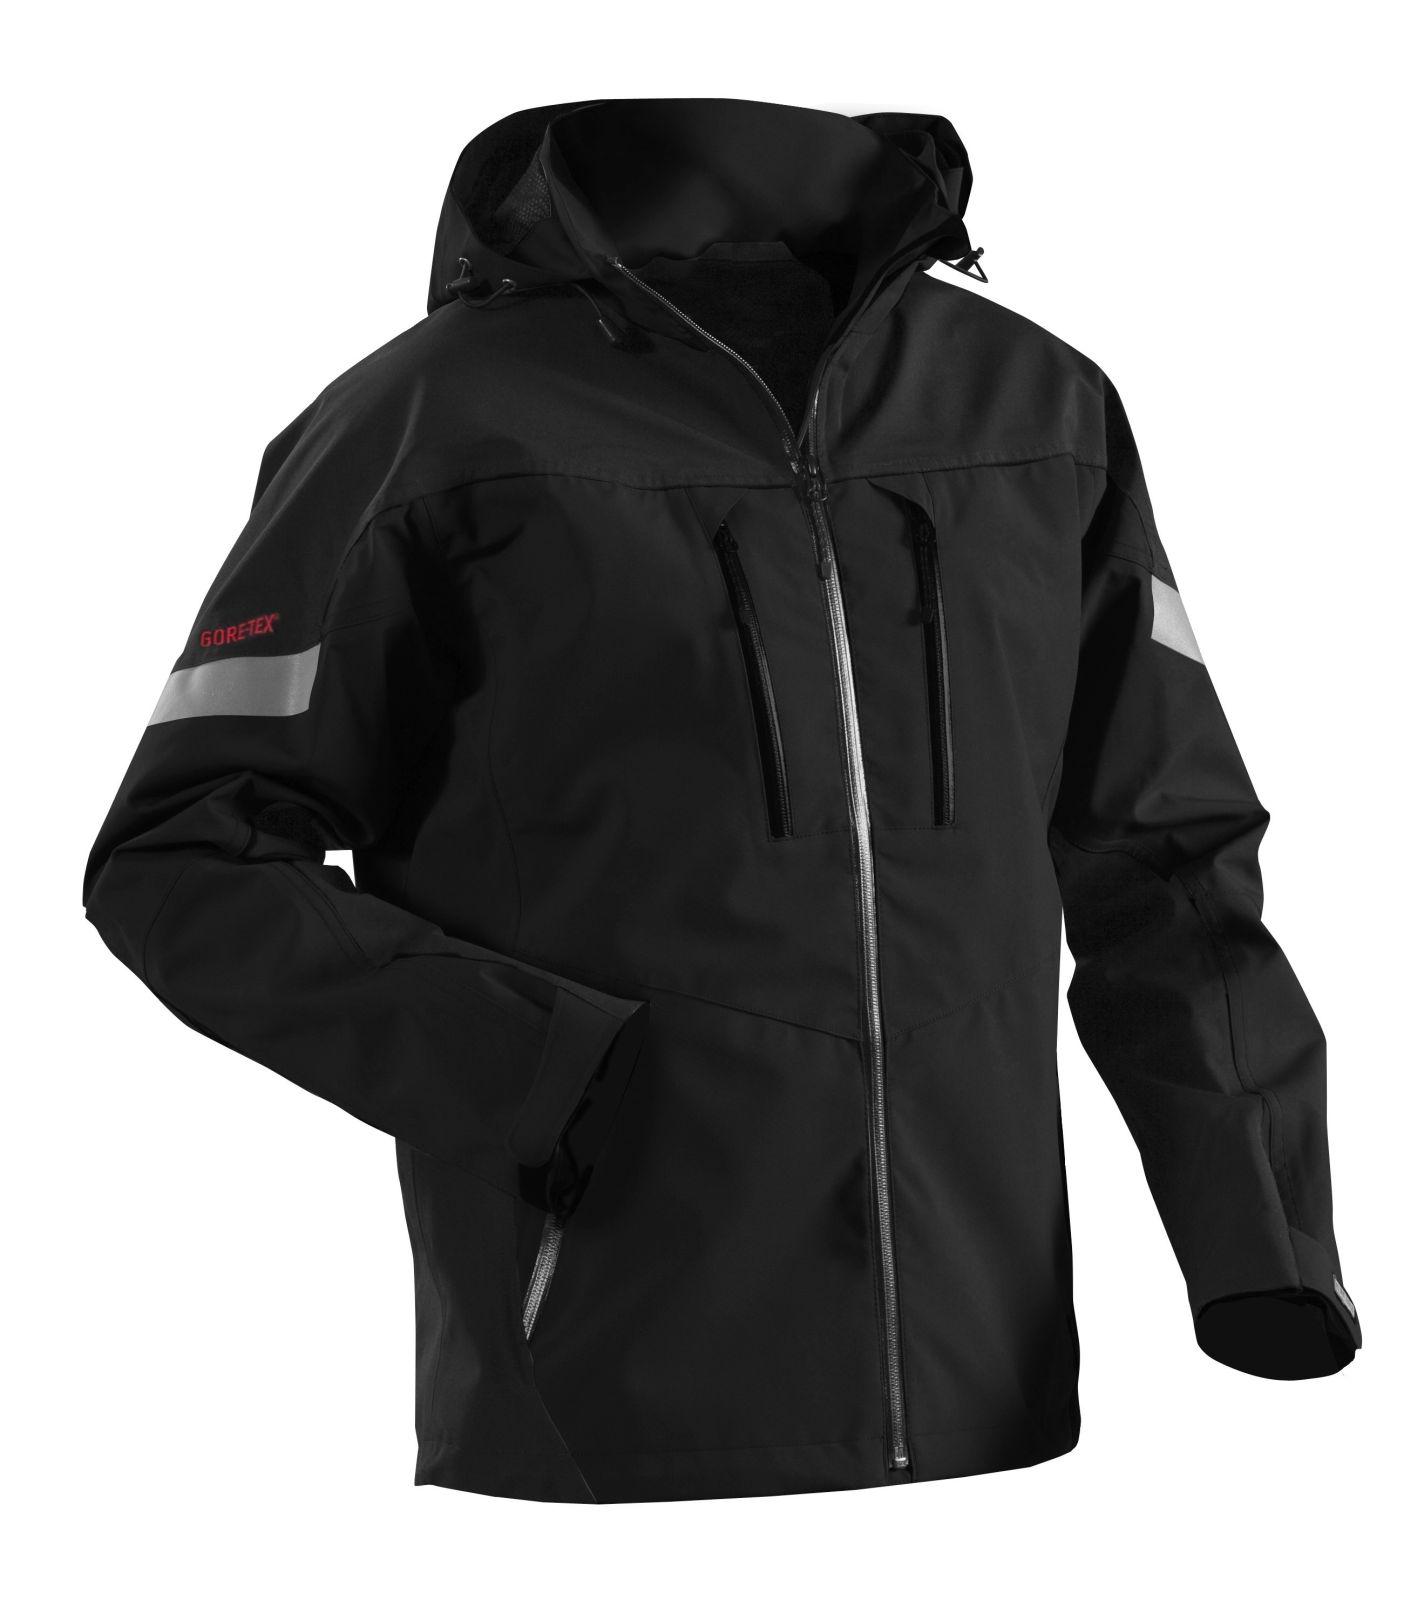 Blaklader Regenjacks 48181420 Gore-Tex zwart(9900)